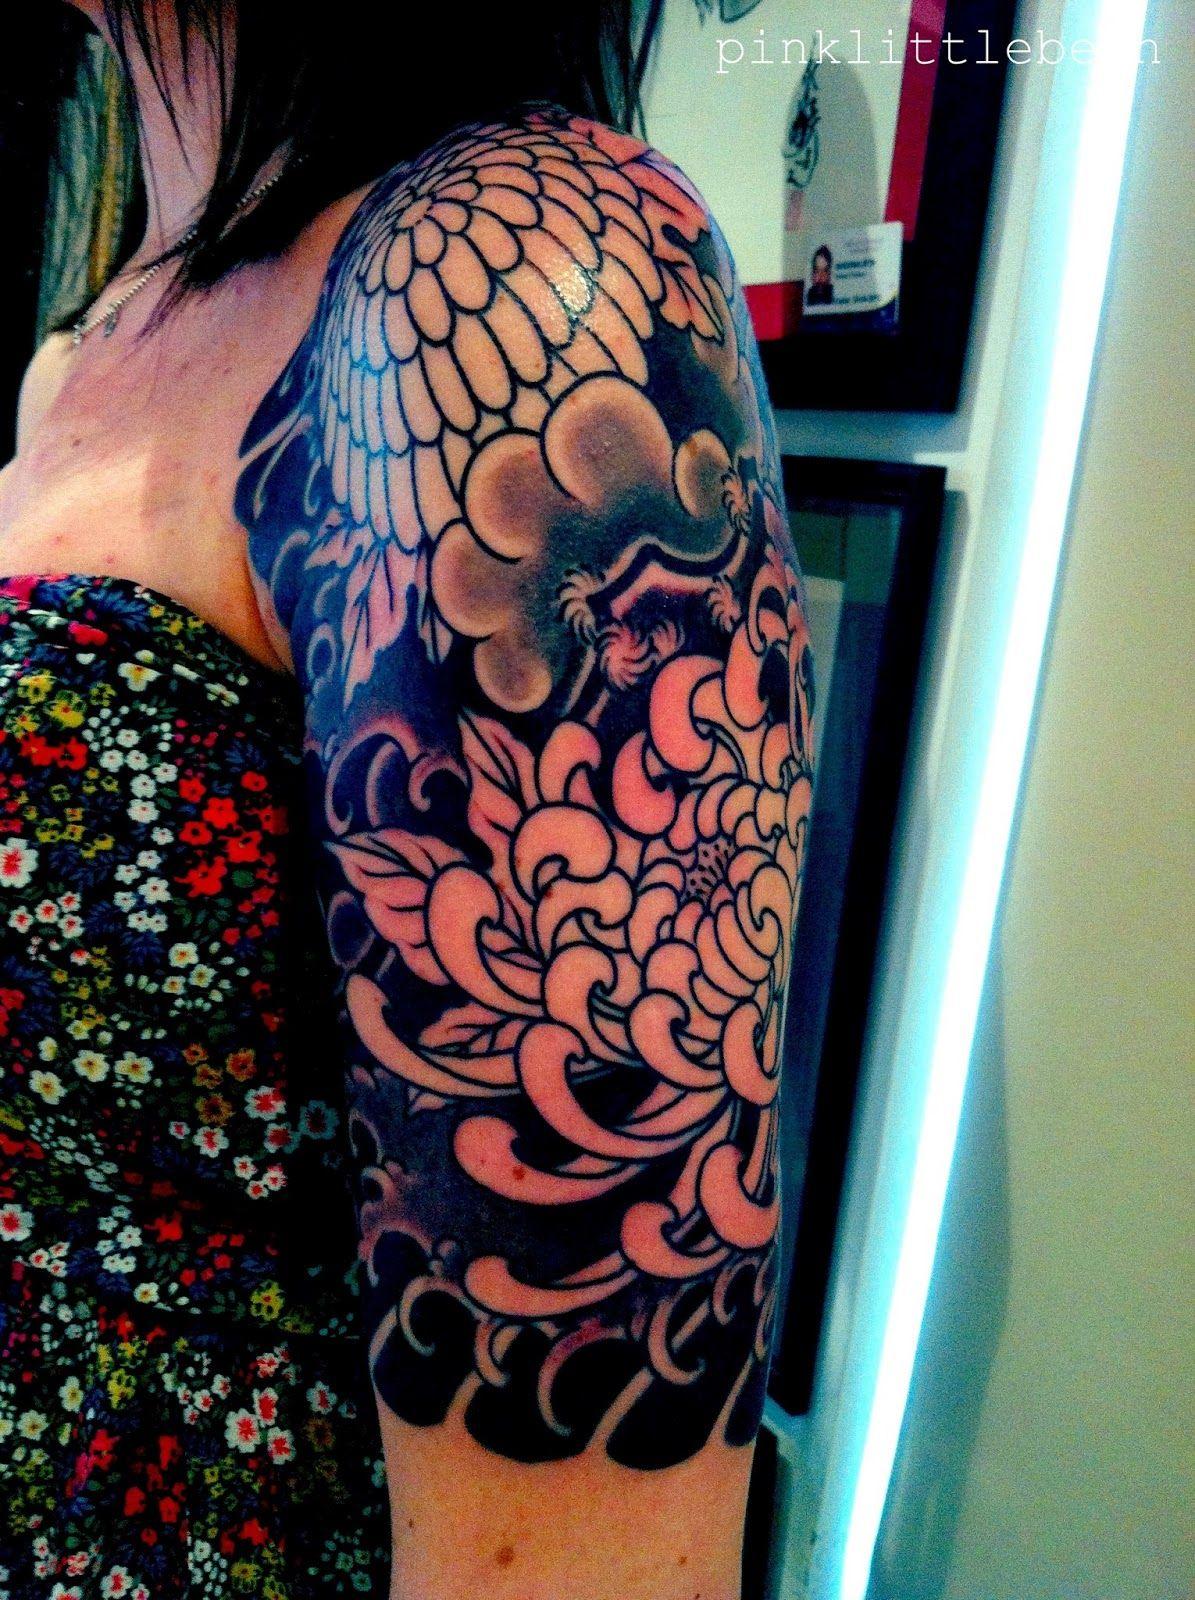 Garden of eden tattoo tattoo in progress part 2 tattoo ideas pinterest tattoo and tatting for Garden of eden tattoo